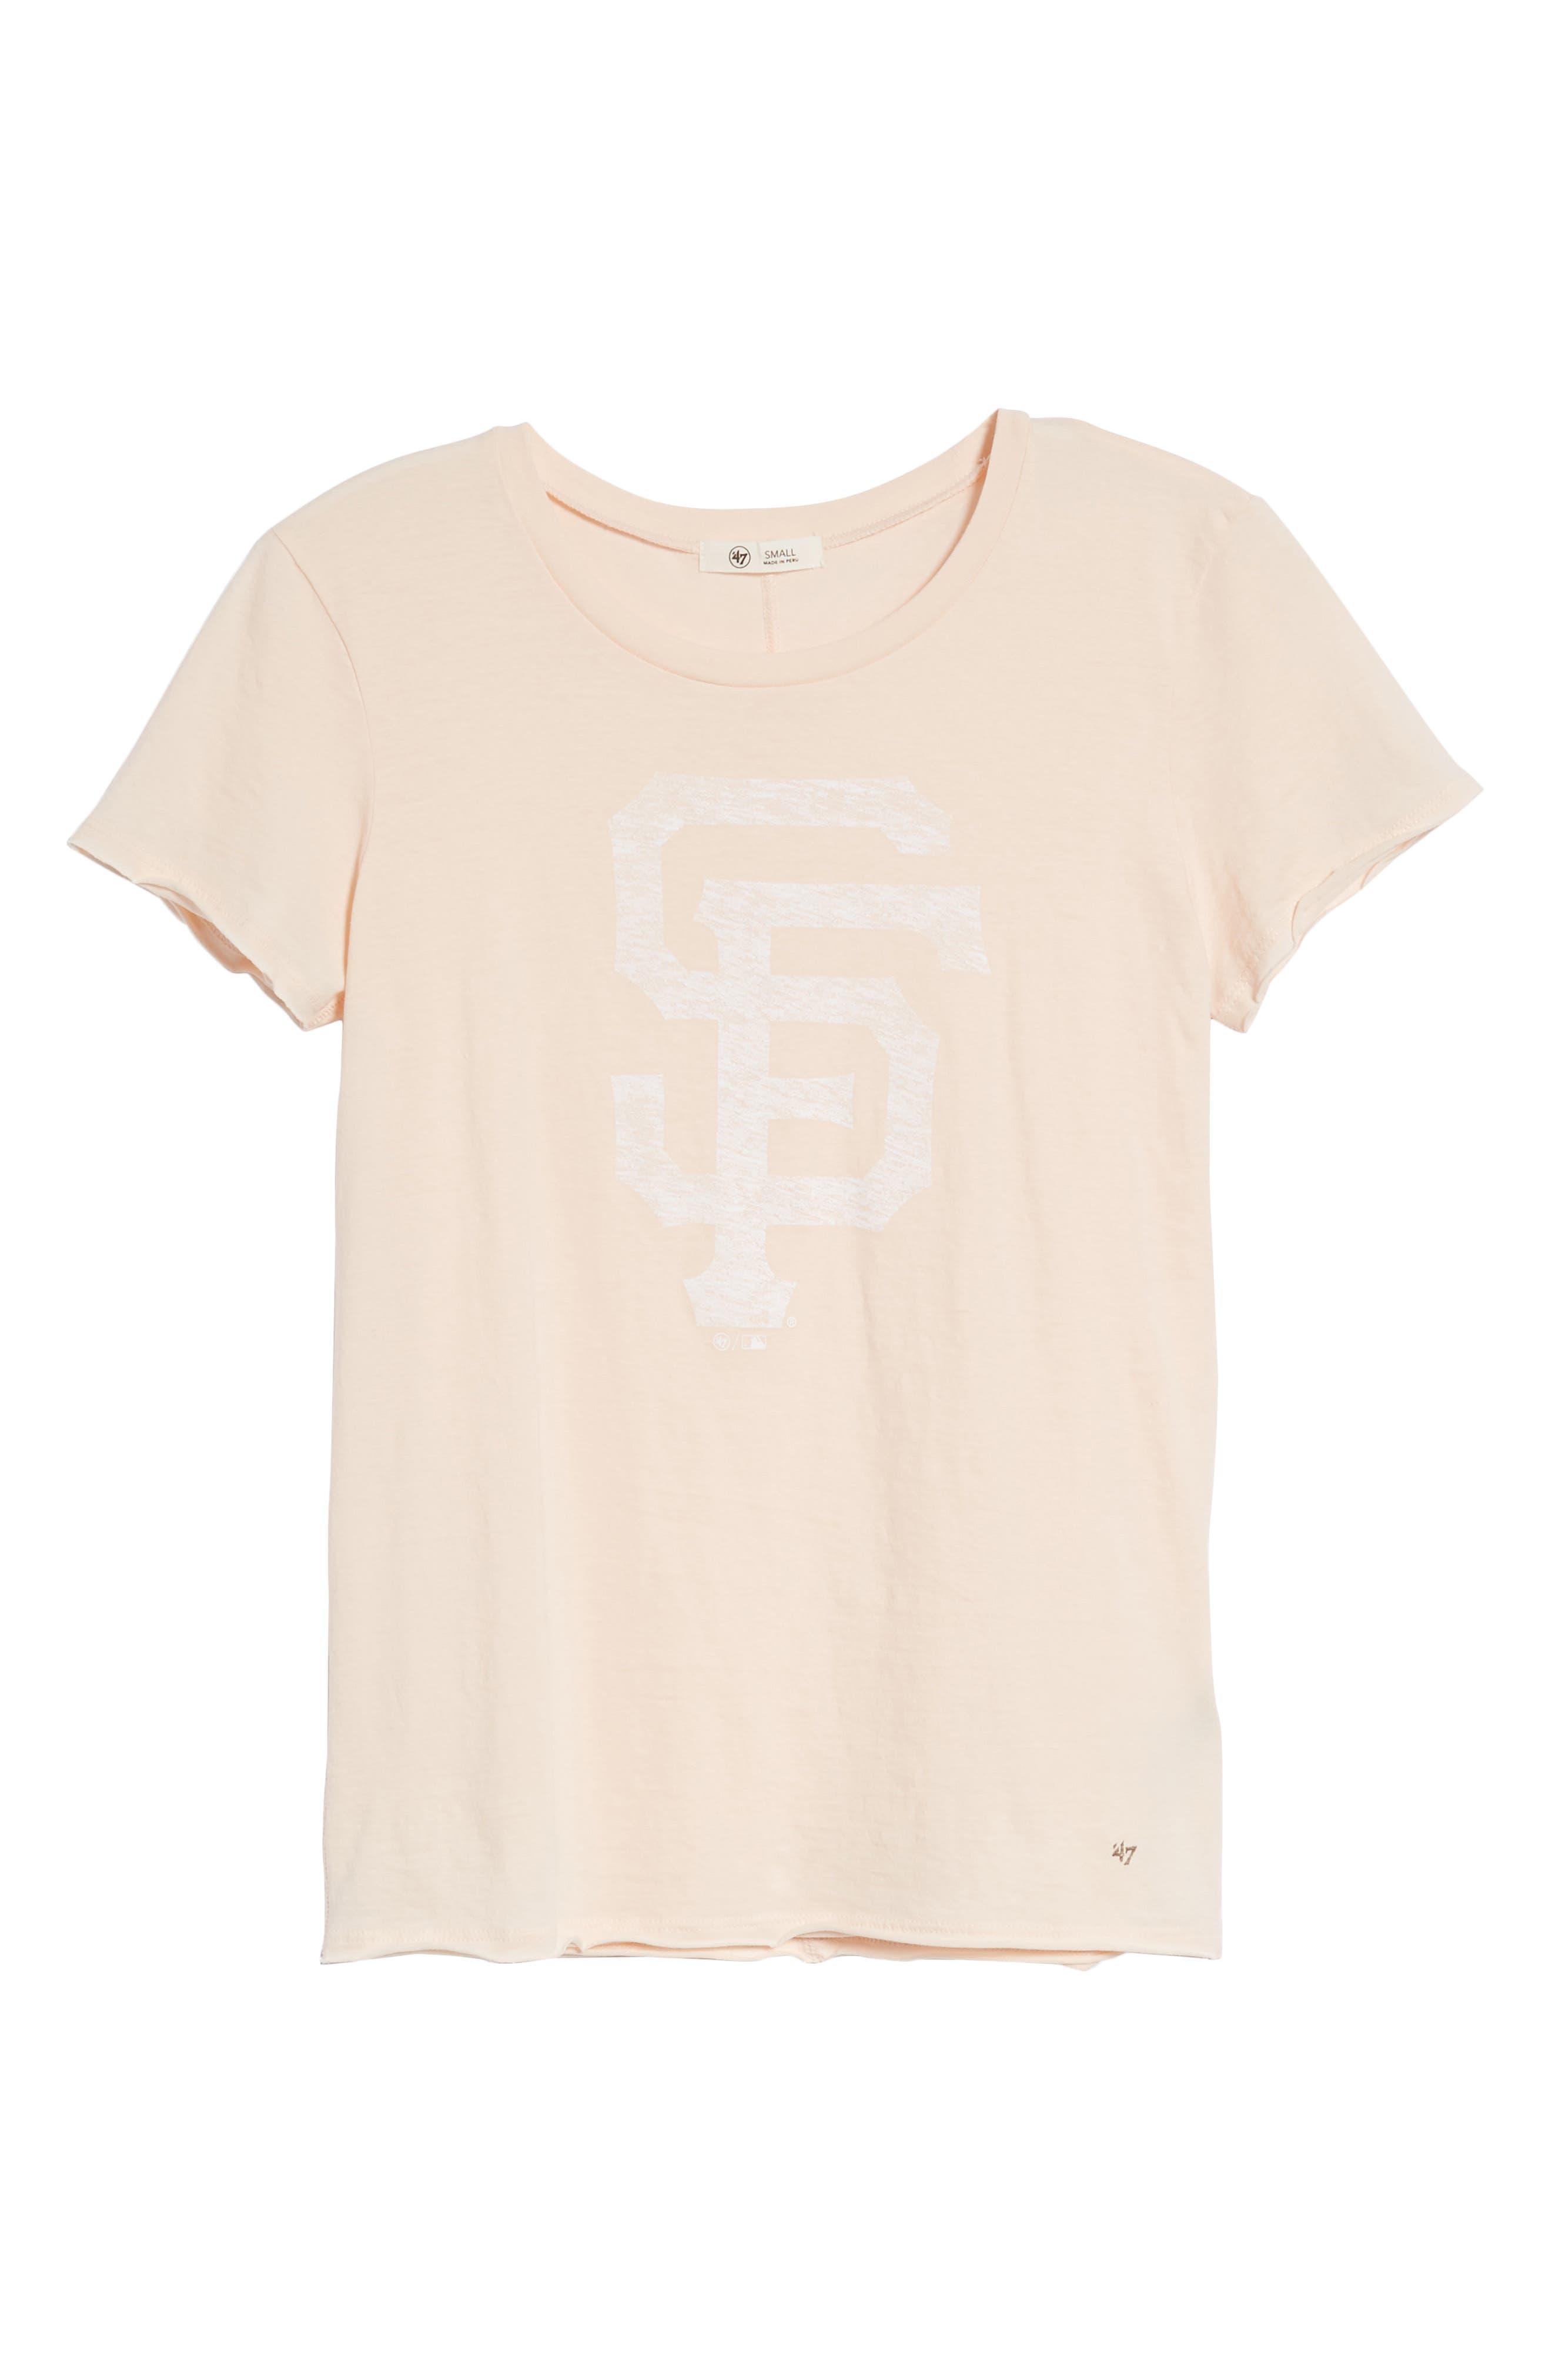 San Francisco Giants Fader Letter Tee,                             Alternate thumbnail 7, color,                             Blush